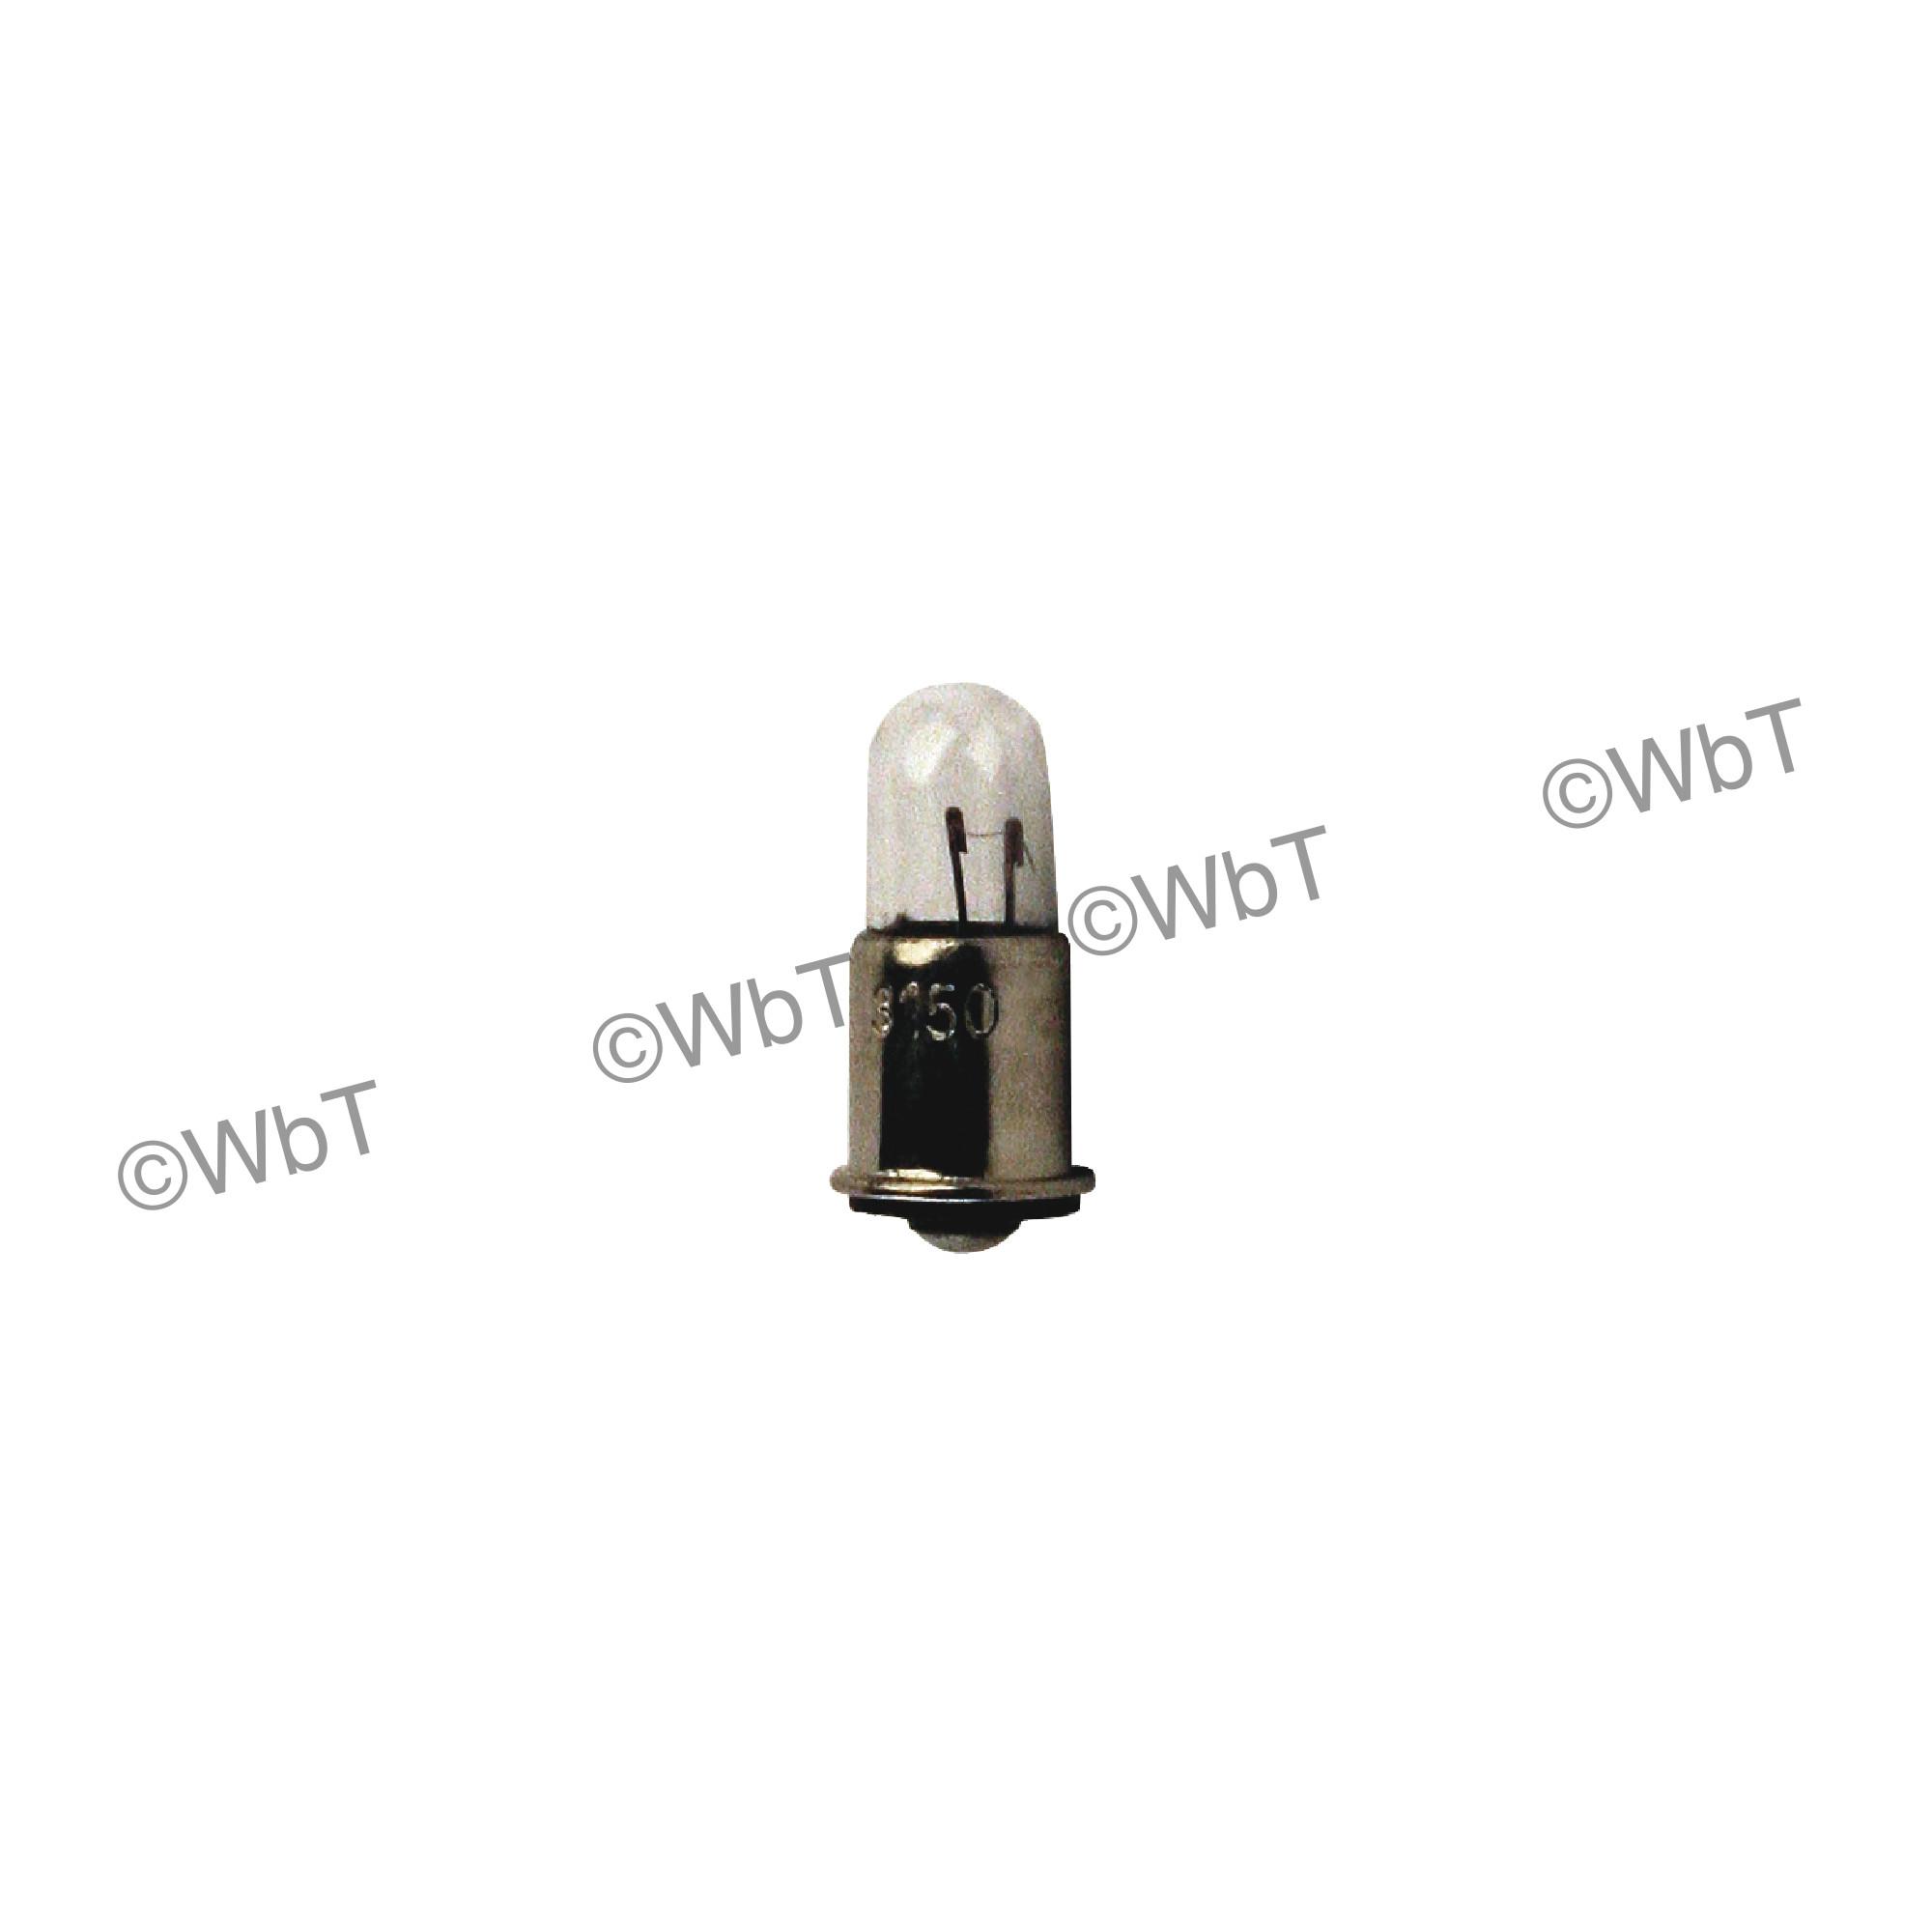 Extra Lamp for Electronic 3-D Finder, Edge Finder & Offset Gage